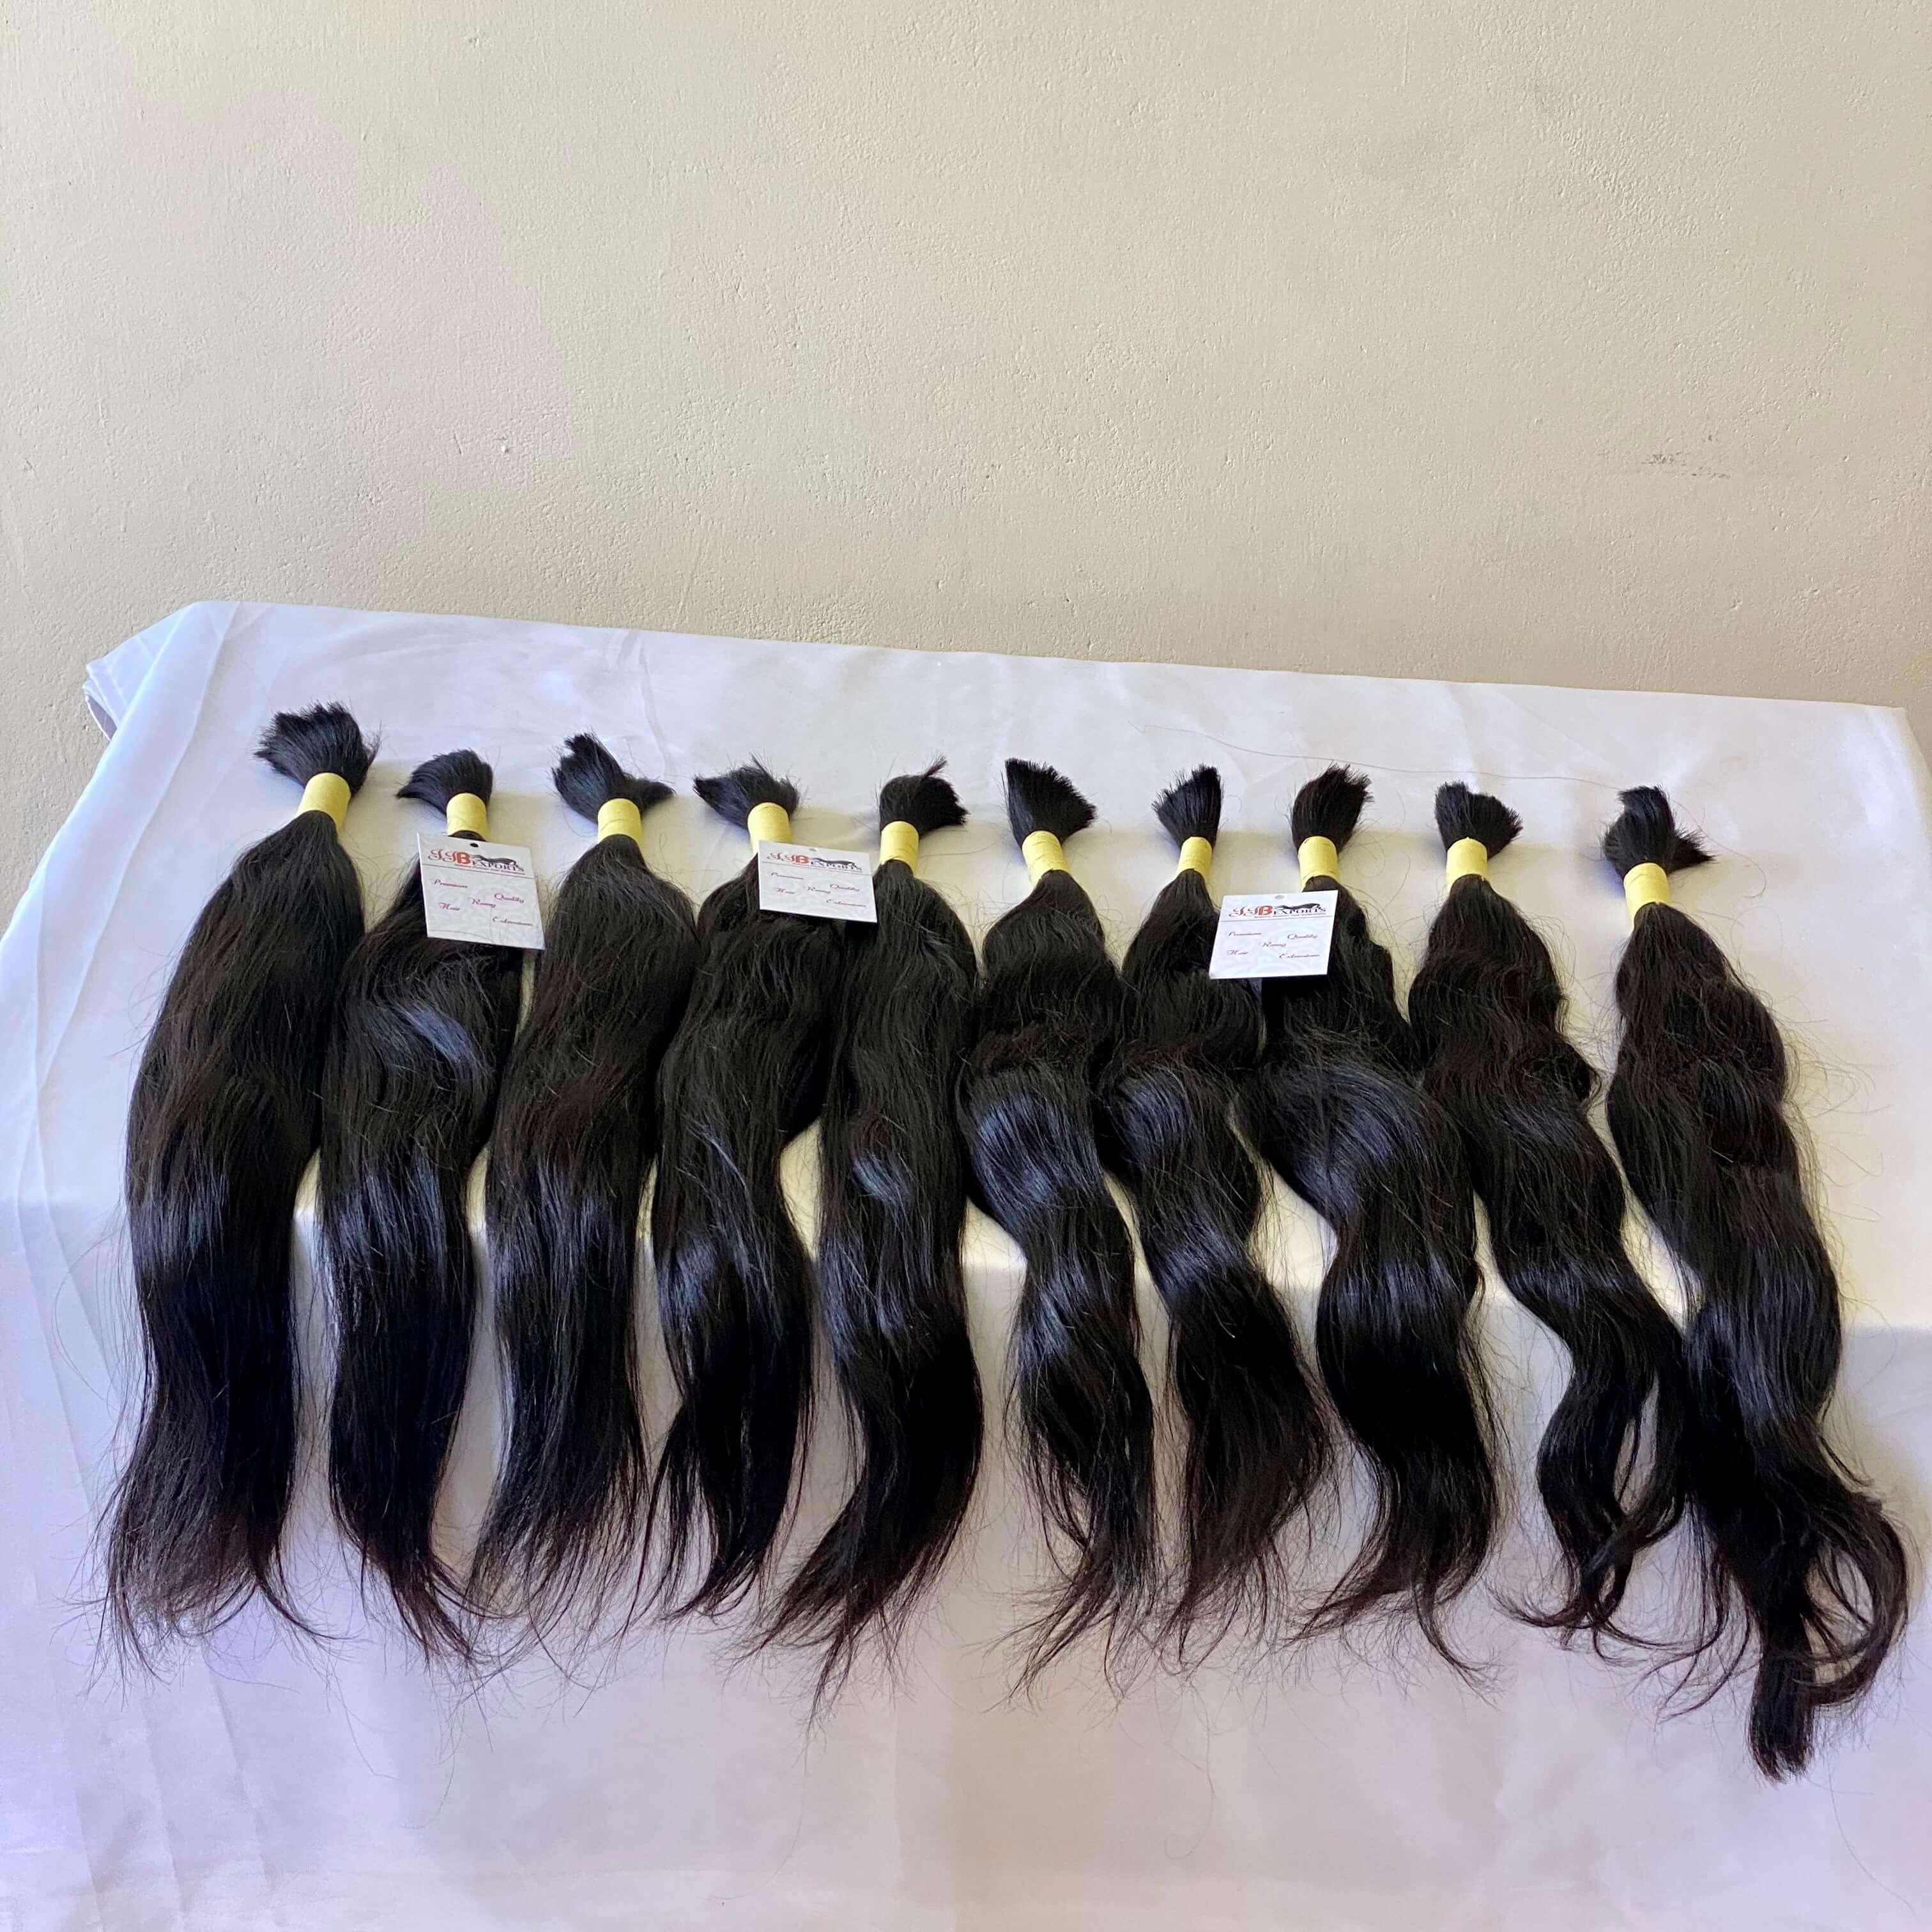 Natural Color Black Women Soft & Silky High Quality 100% Virgin Indian/brazilian Bulk Human Hair